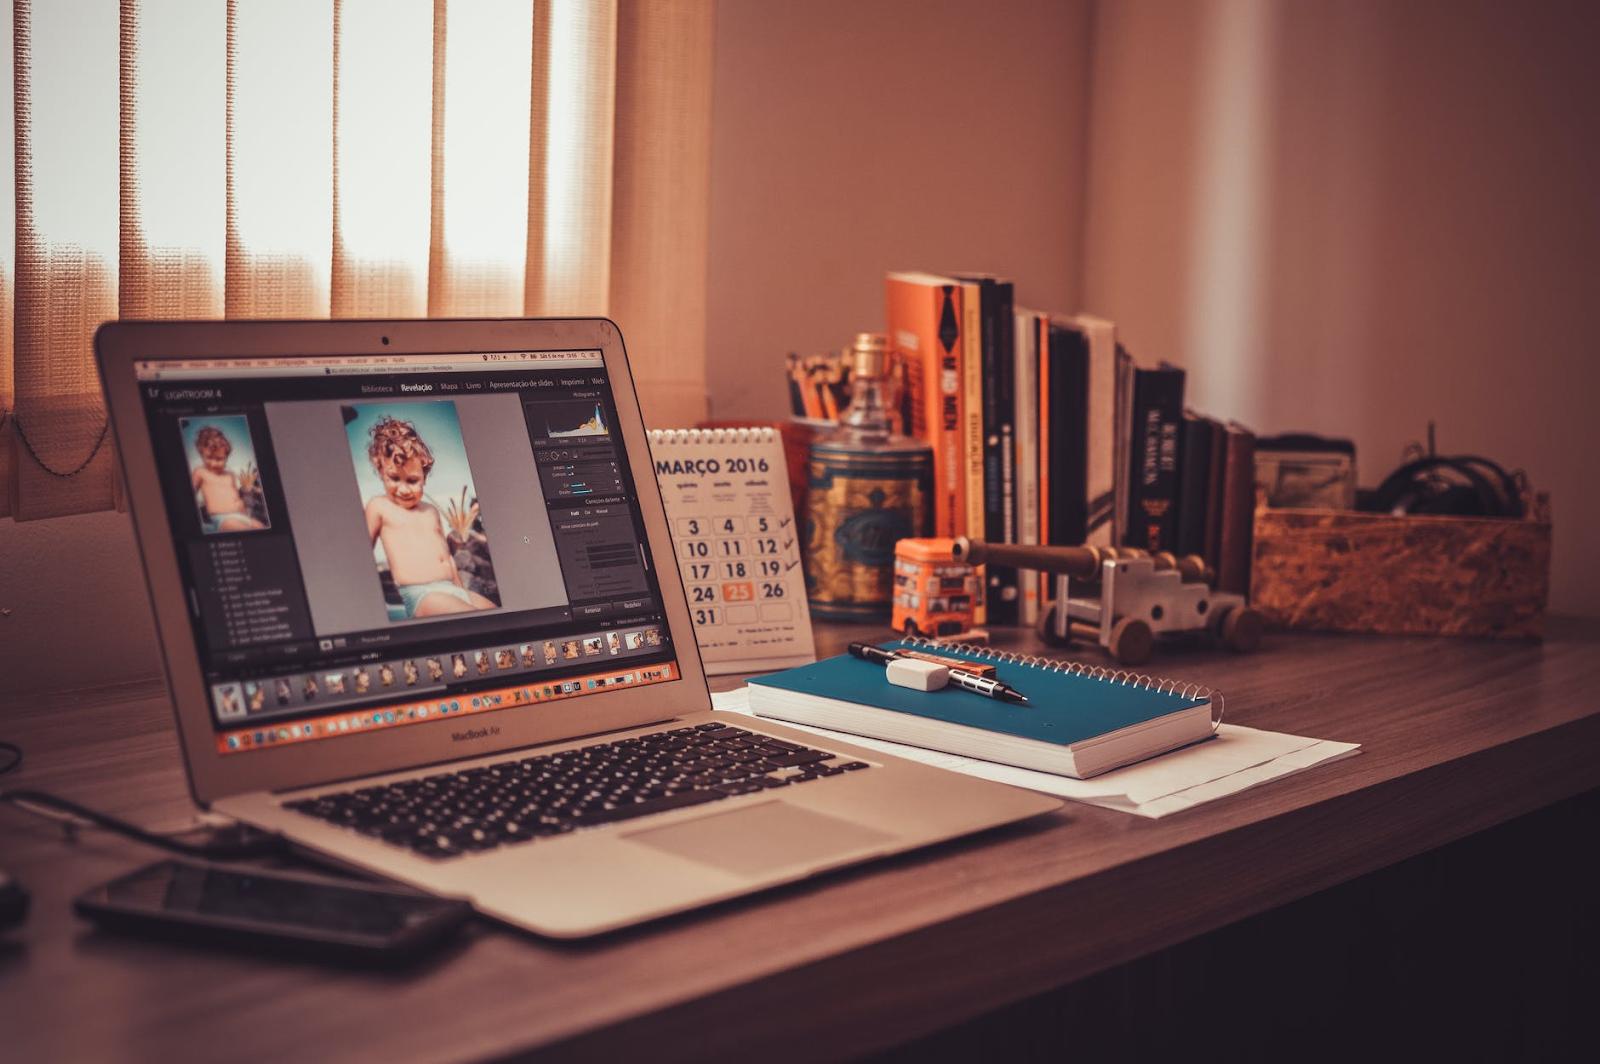 5 Tips To Get Through Online Classes, For My Fellow Procrastinators